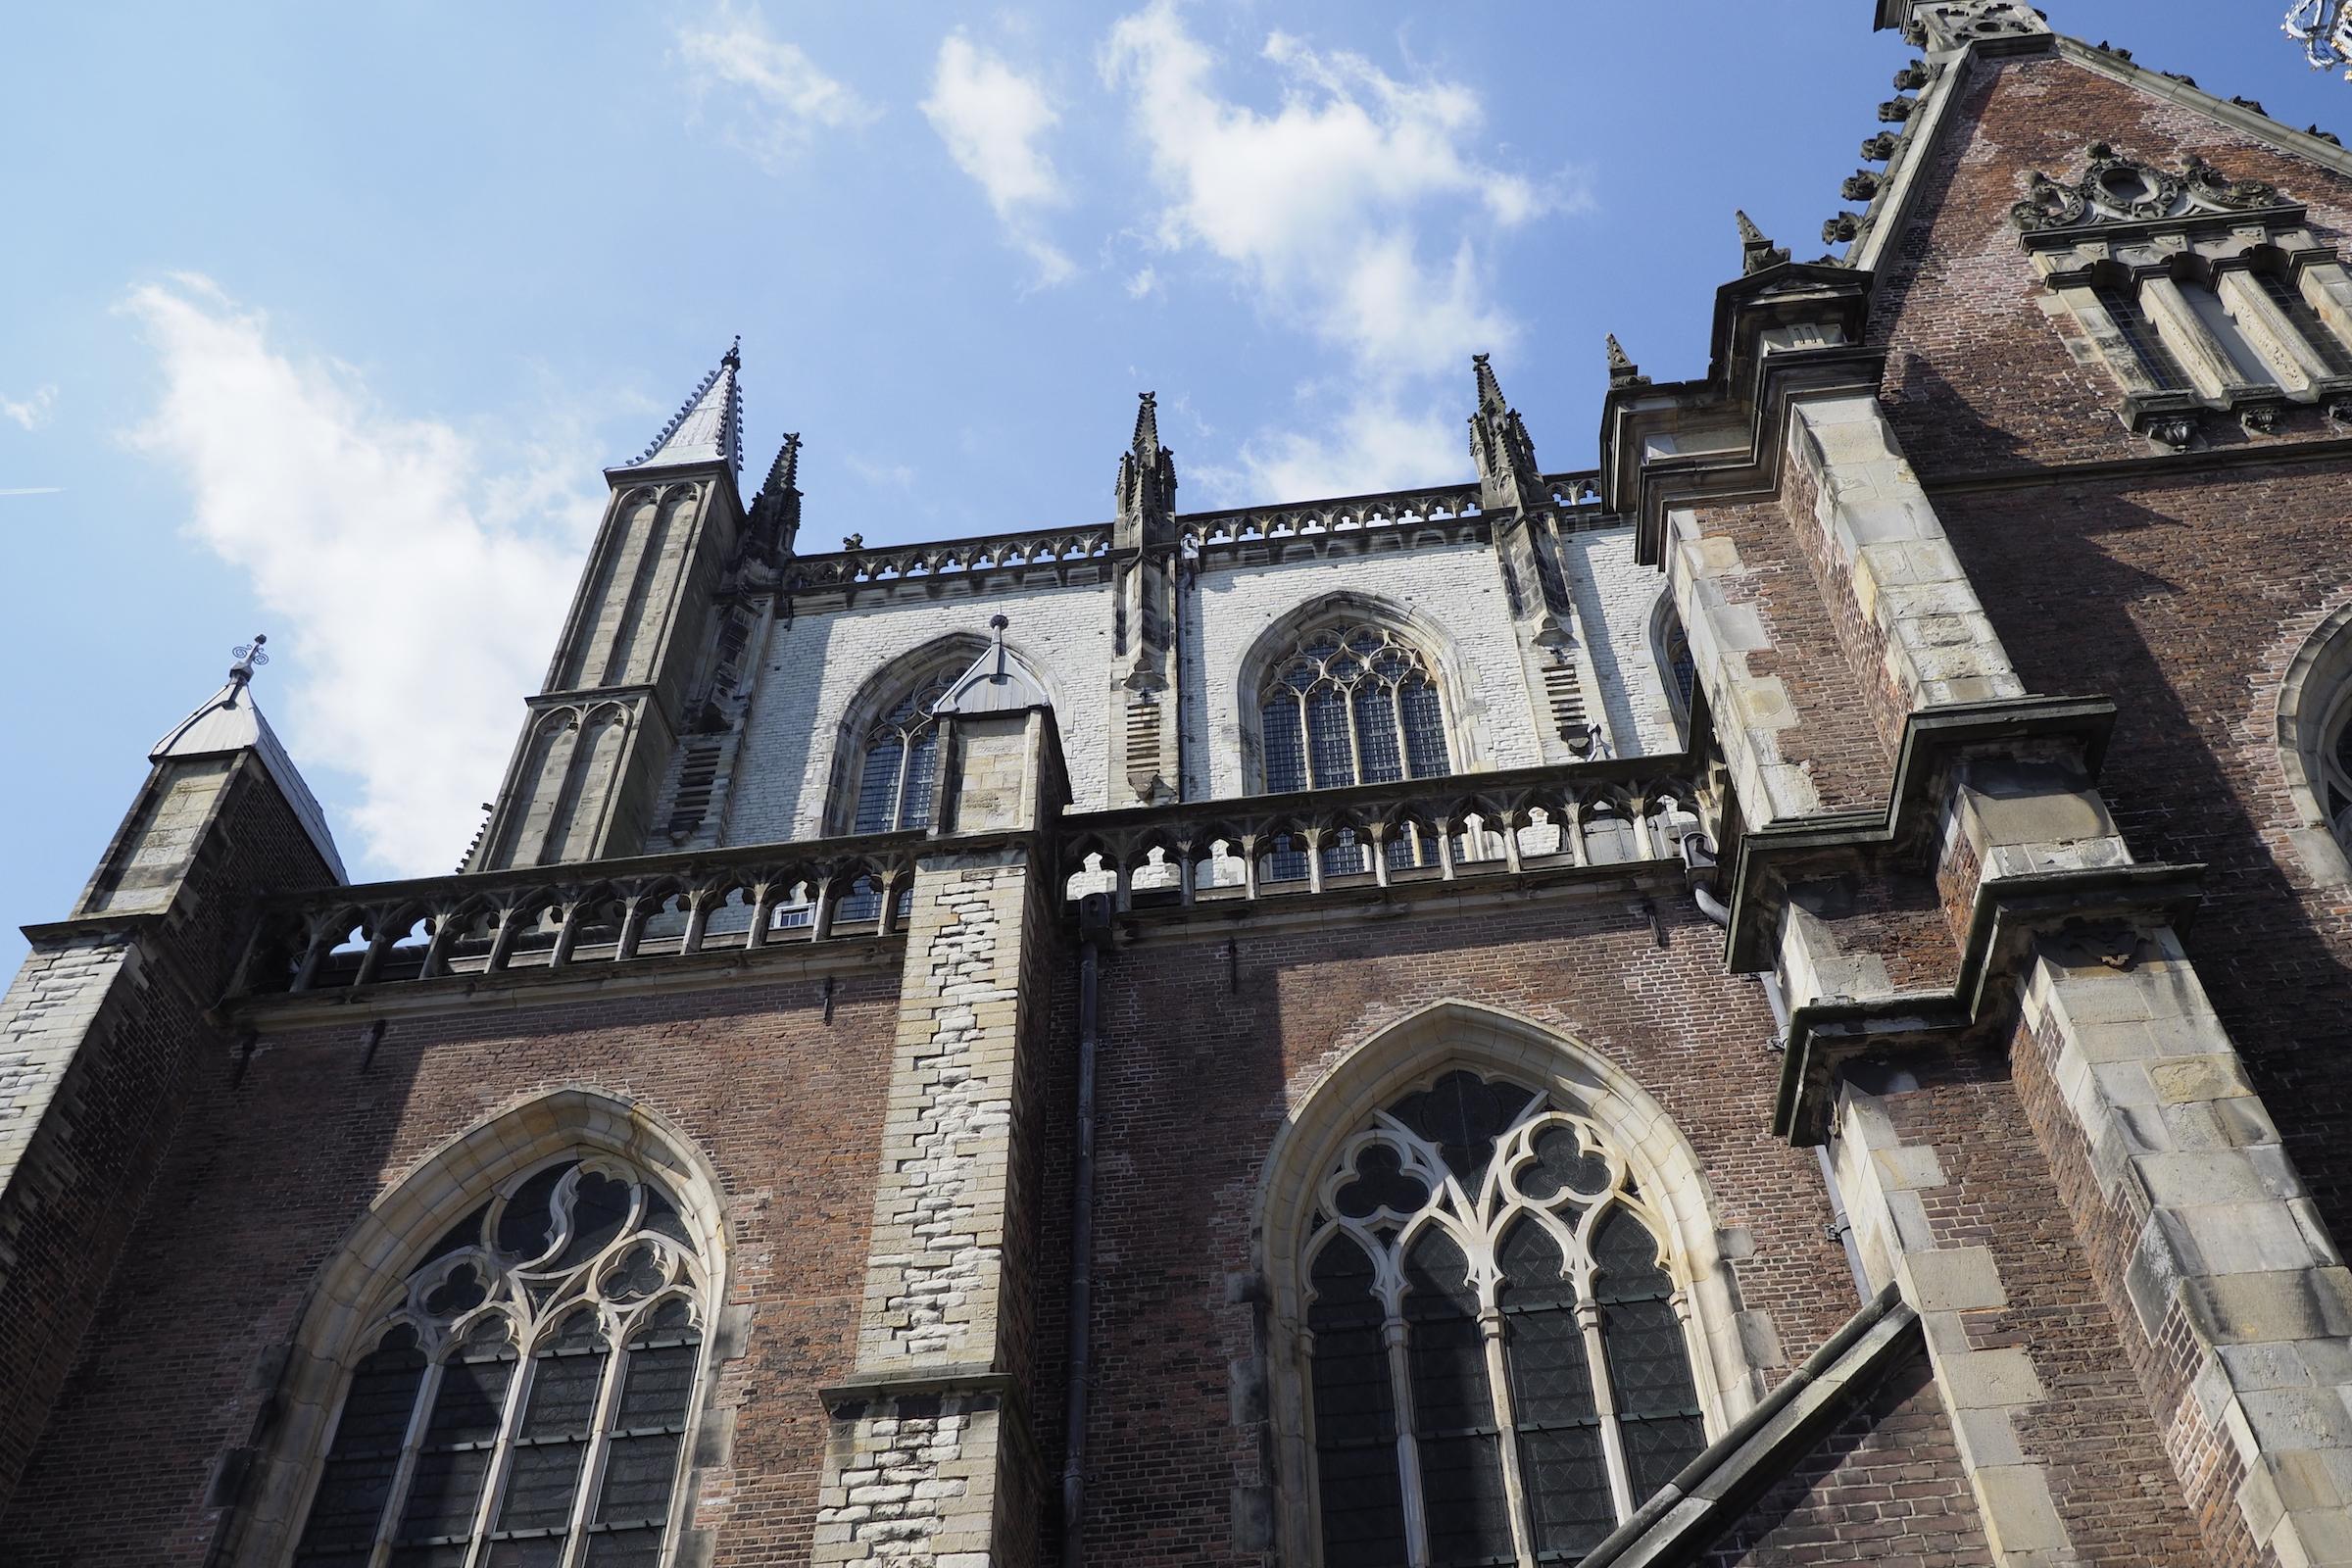 Grote Kerk aka St. Bavokerk (Great Church aka Saint Bavo Church) Haarlem, The Netherlands, Photo credit: Richard Terborg